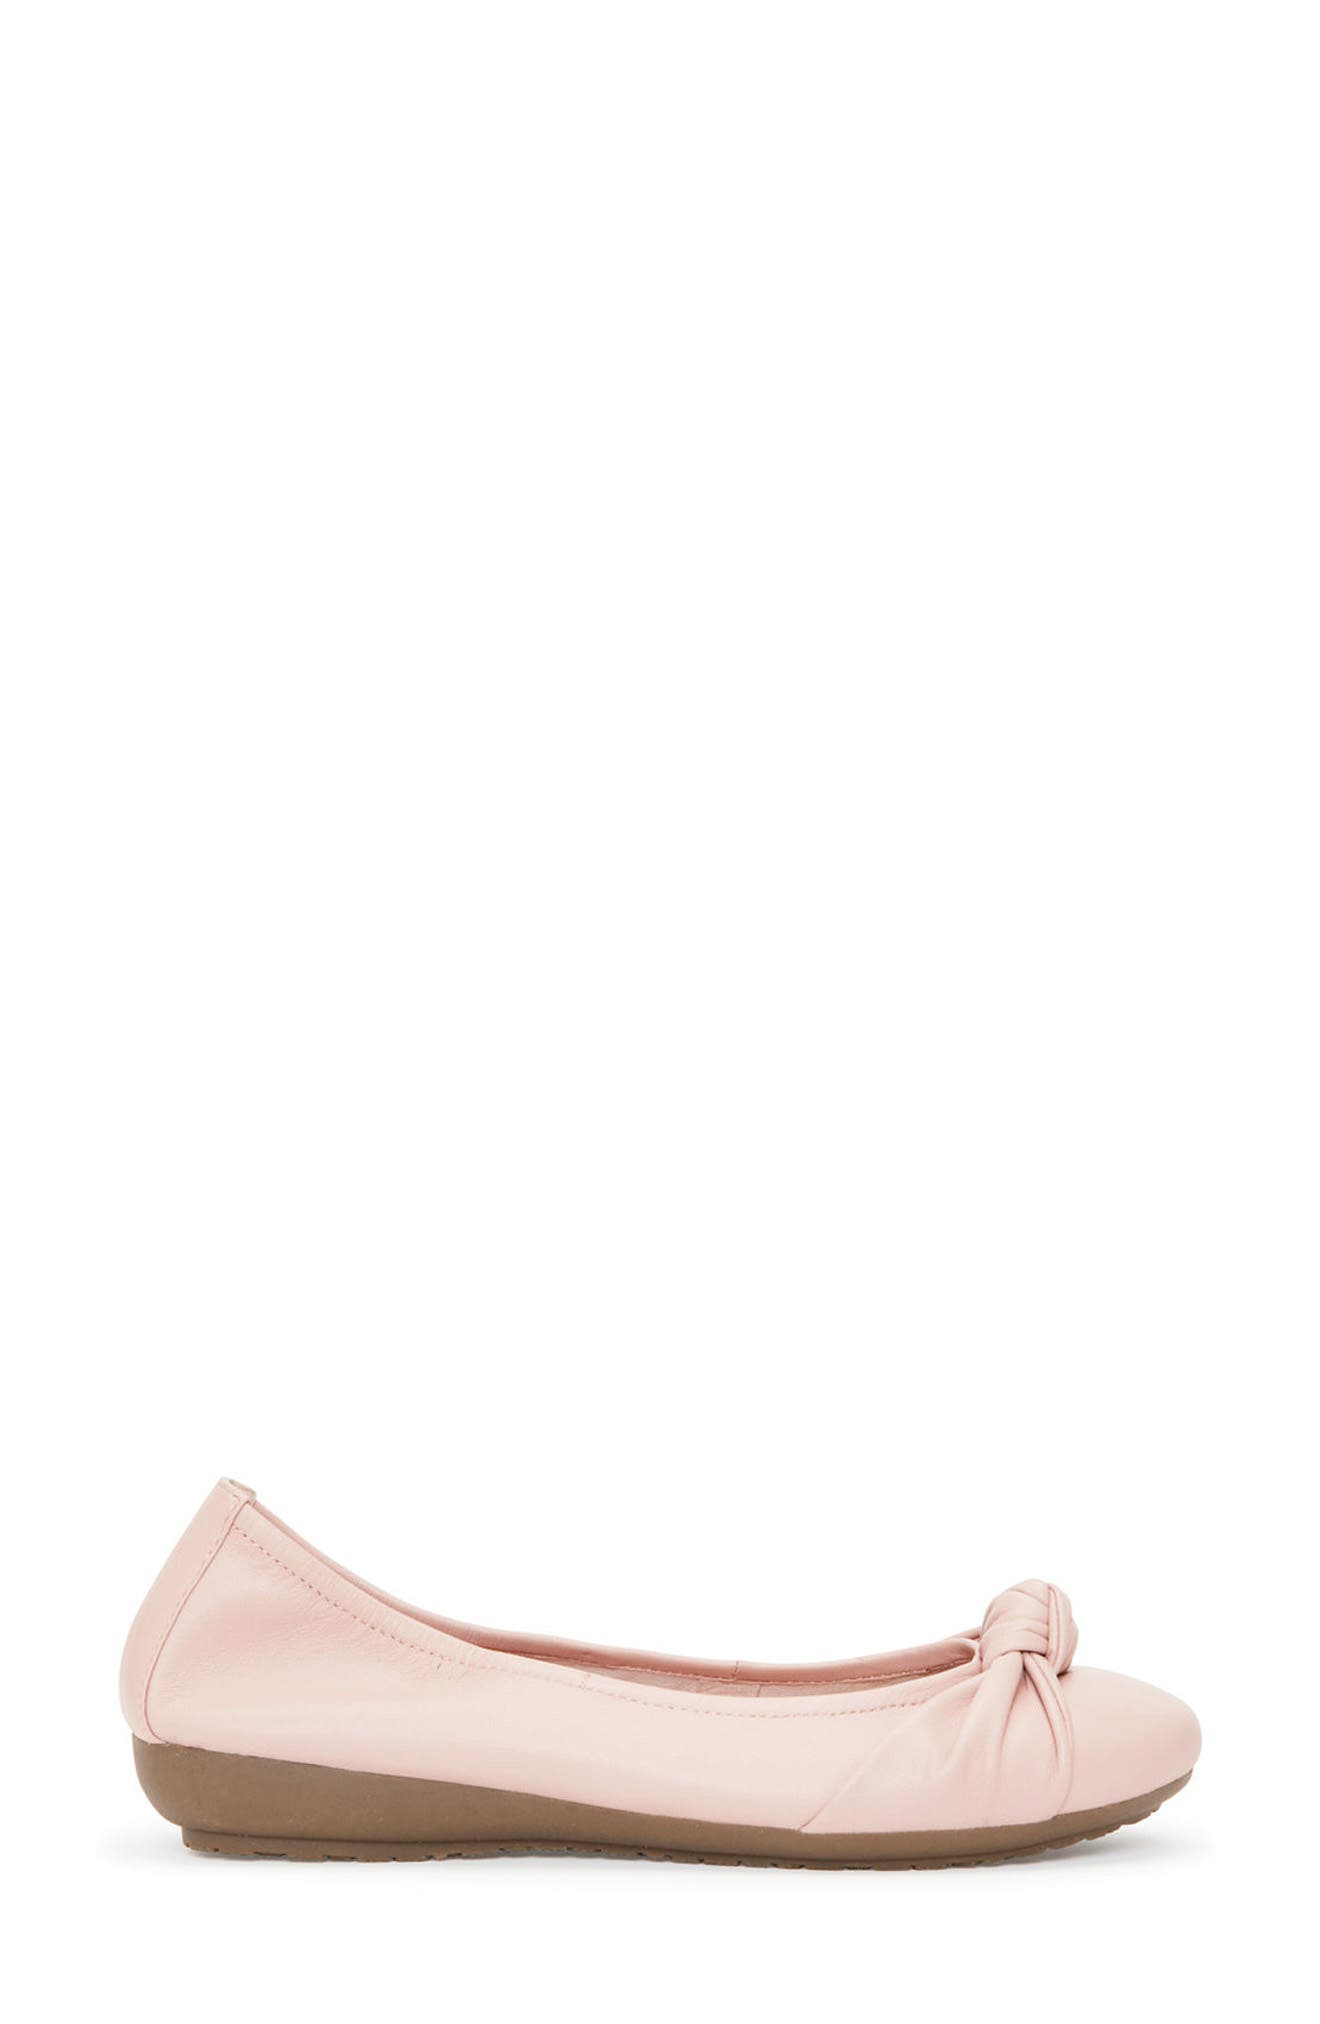 Jaci Flat,                             Alternate thumbnail 3, color,                             Pink Leather